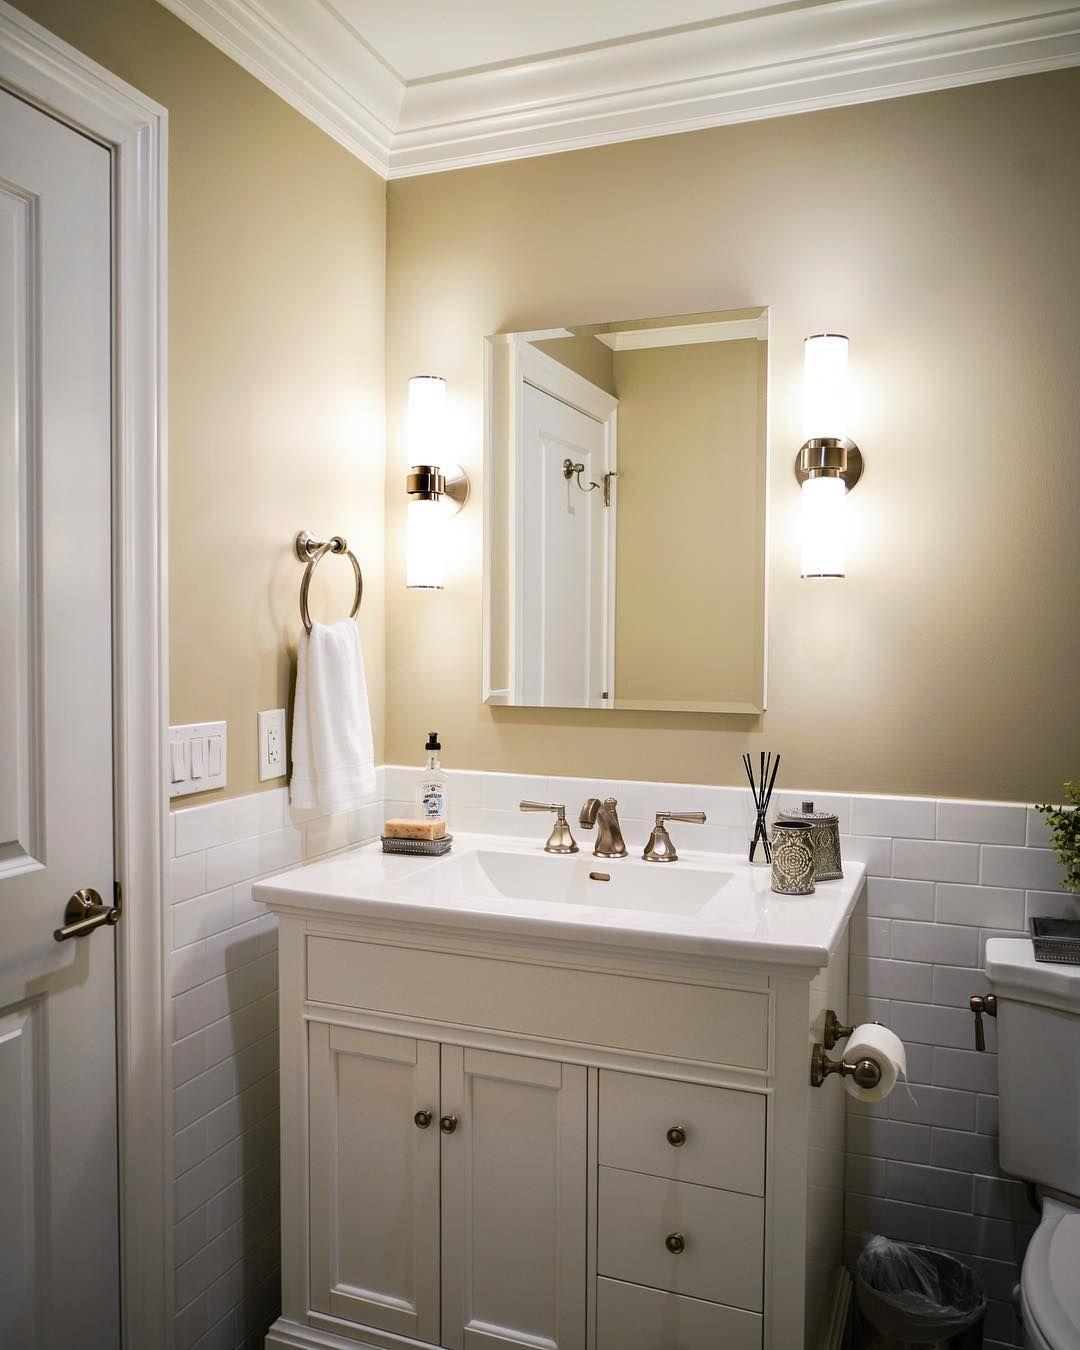 Excellent Upgrading A Bathroom Adding Crown Molding Elegant Home Remodeling Inspirations Basidirectenergyitoicom